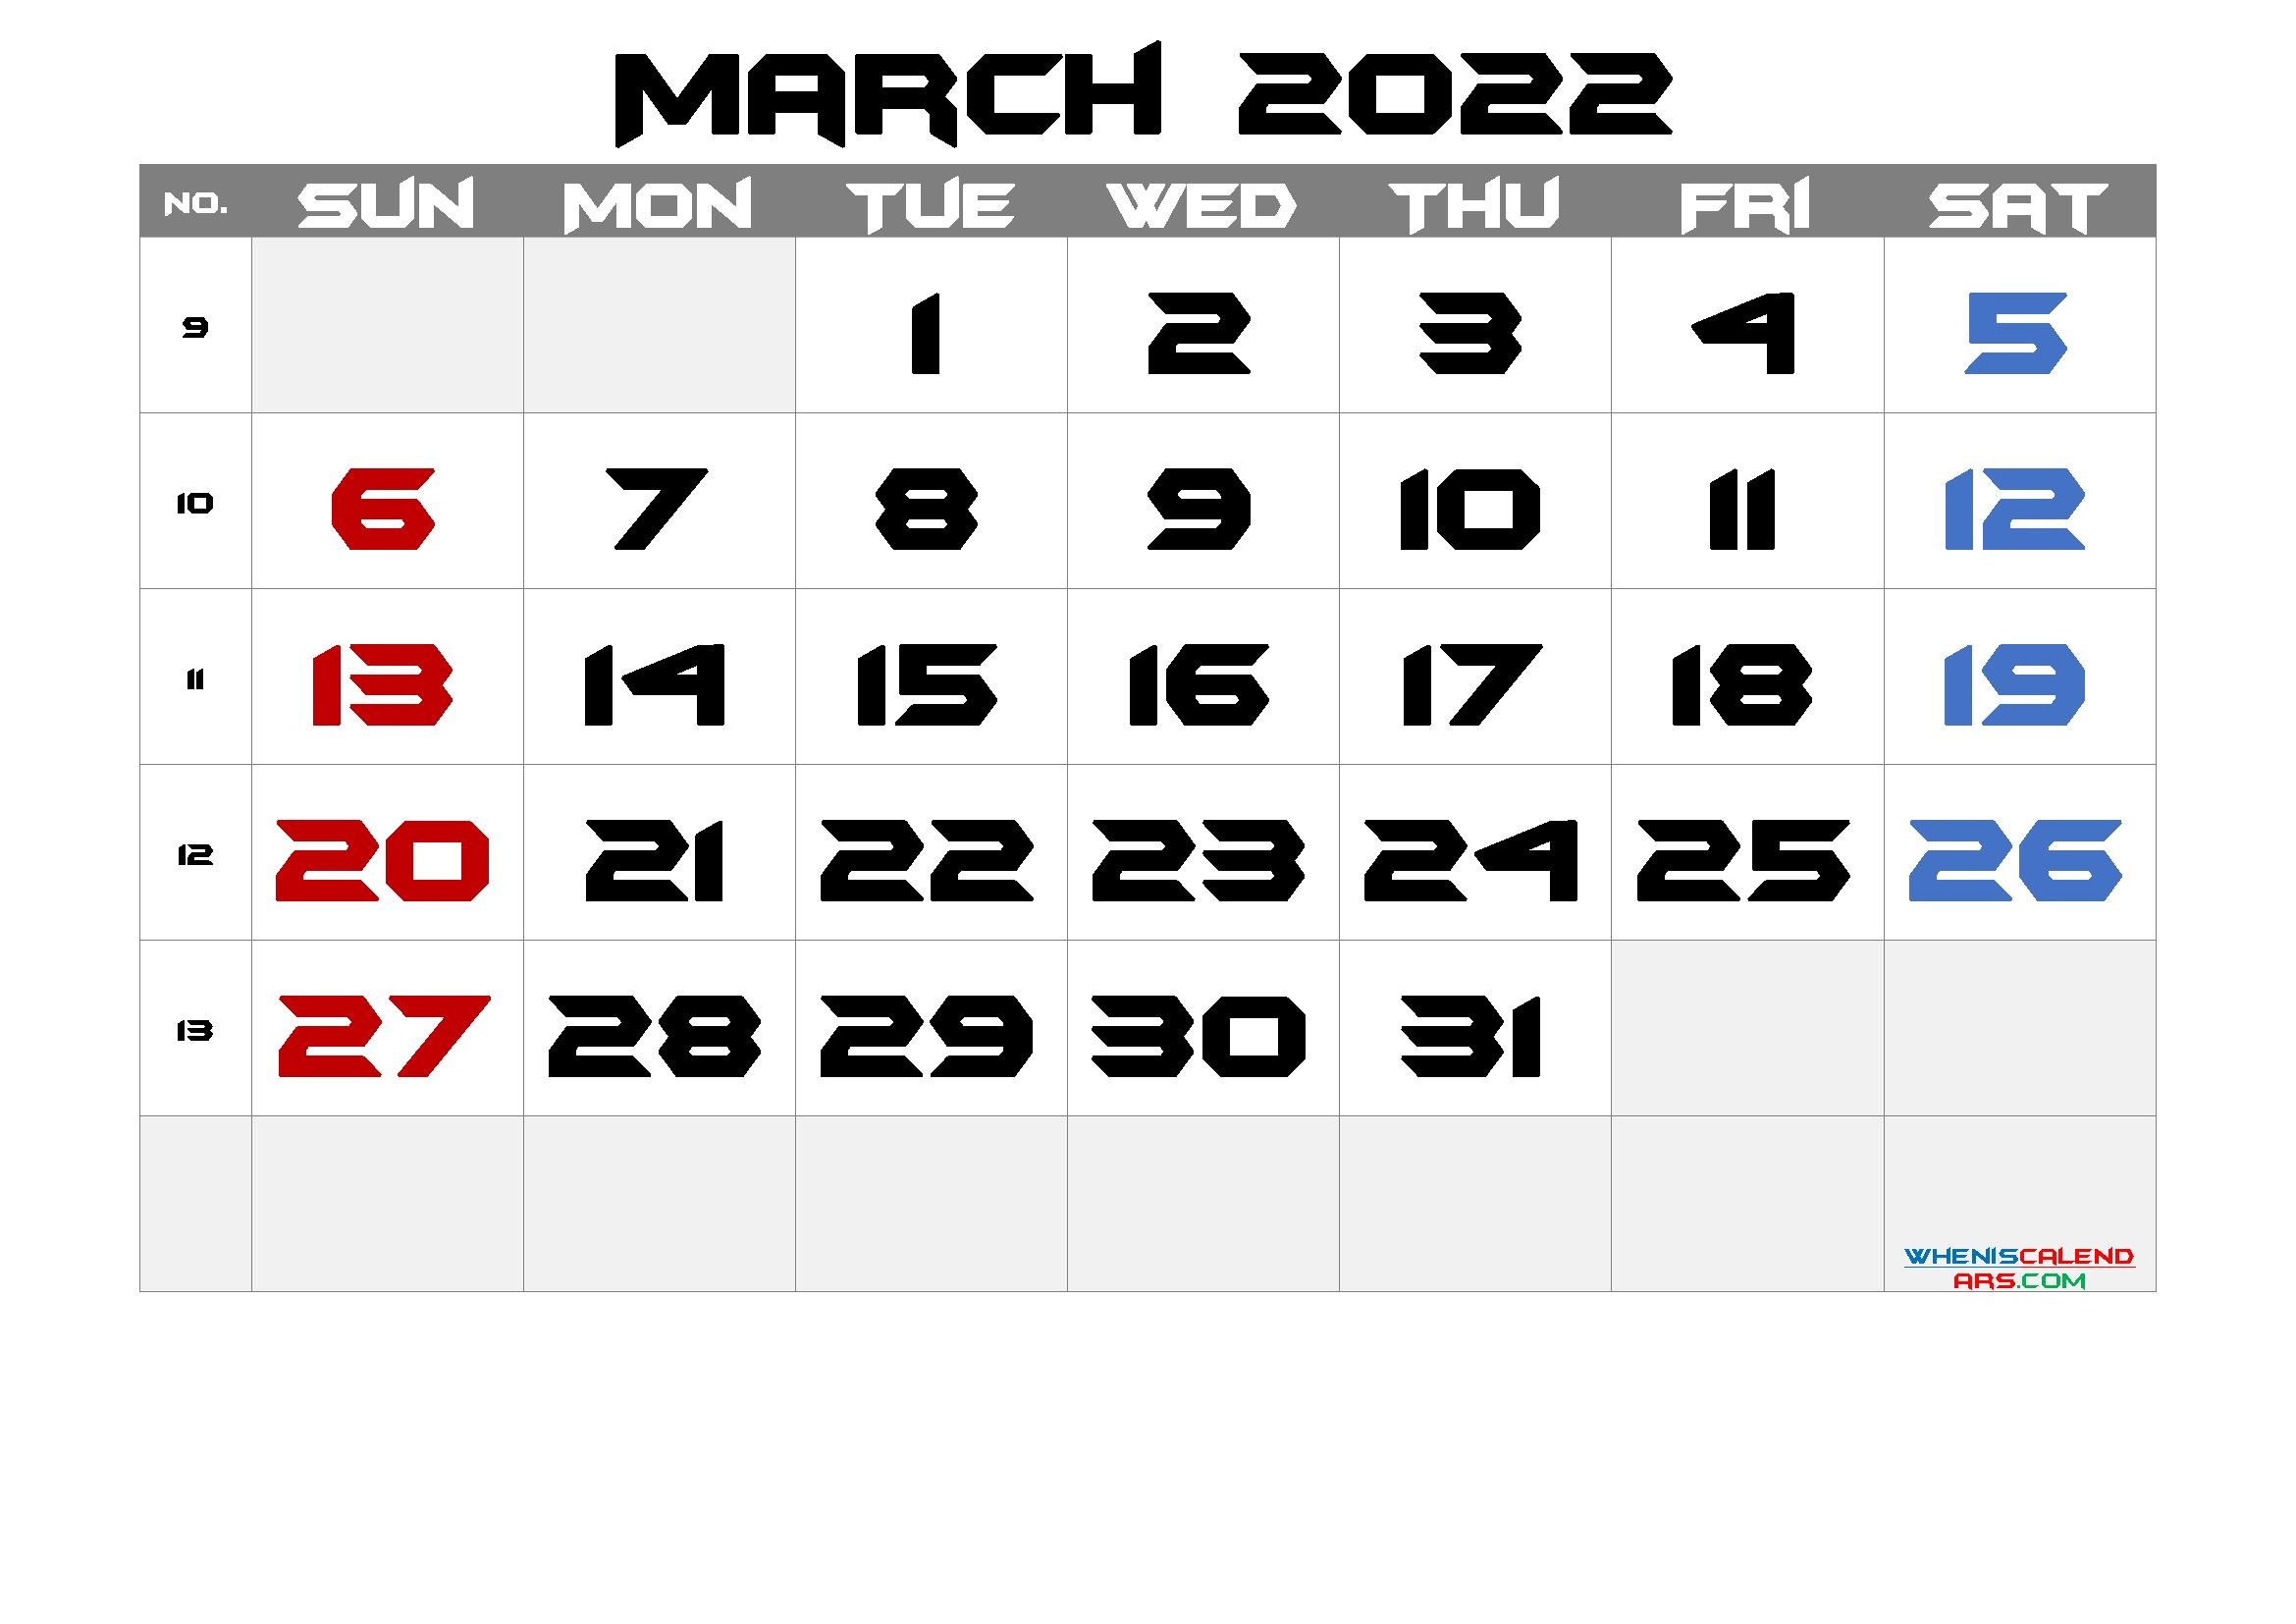 2022 March Free Printable Calendar